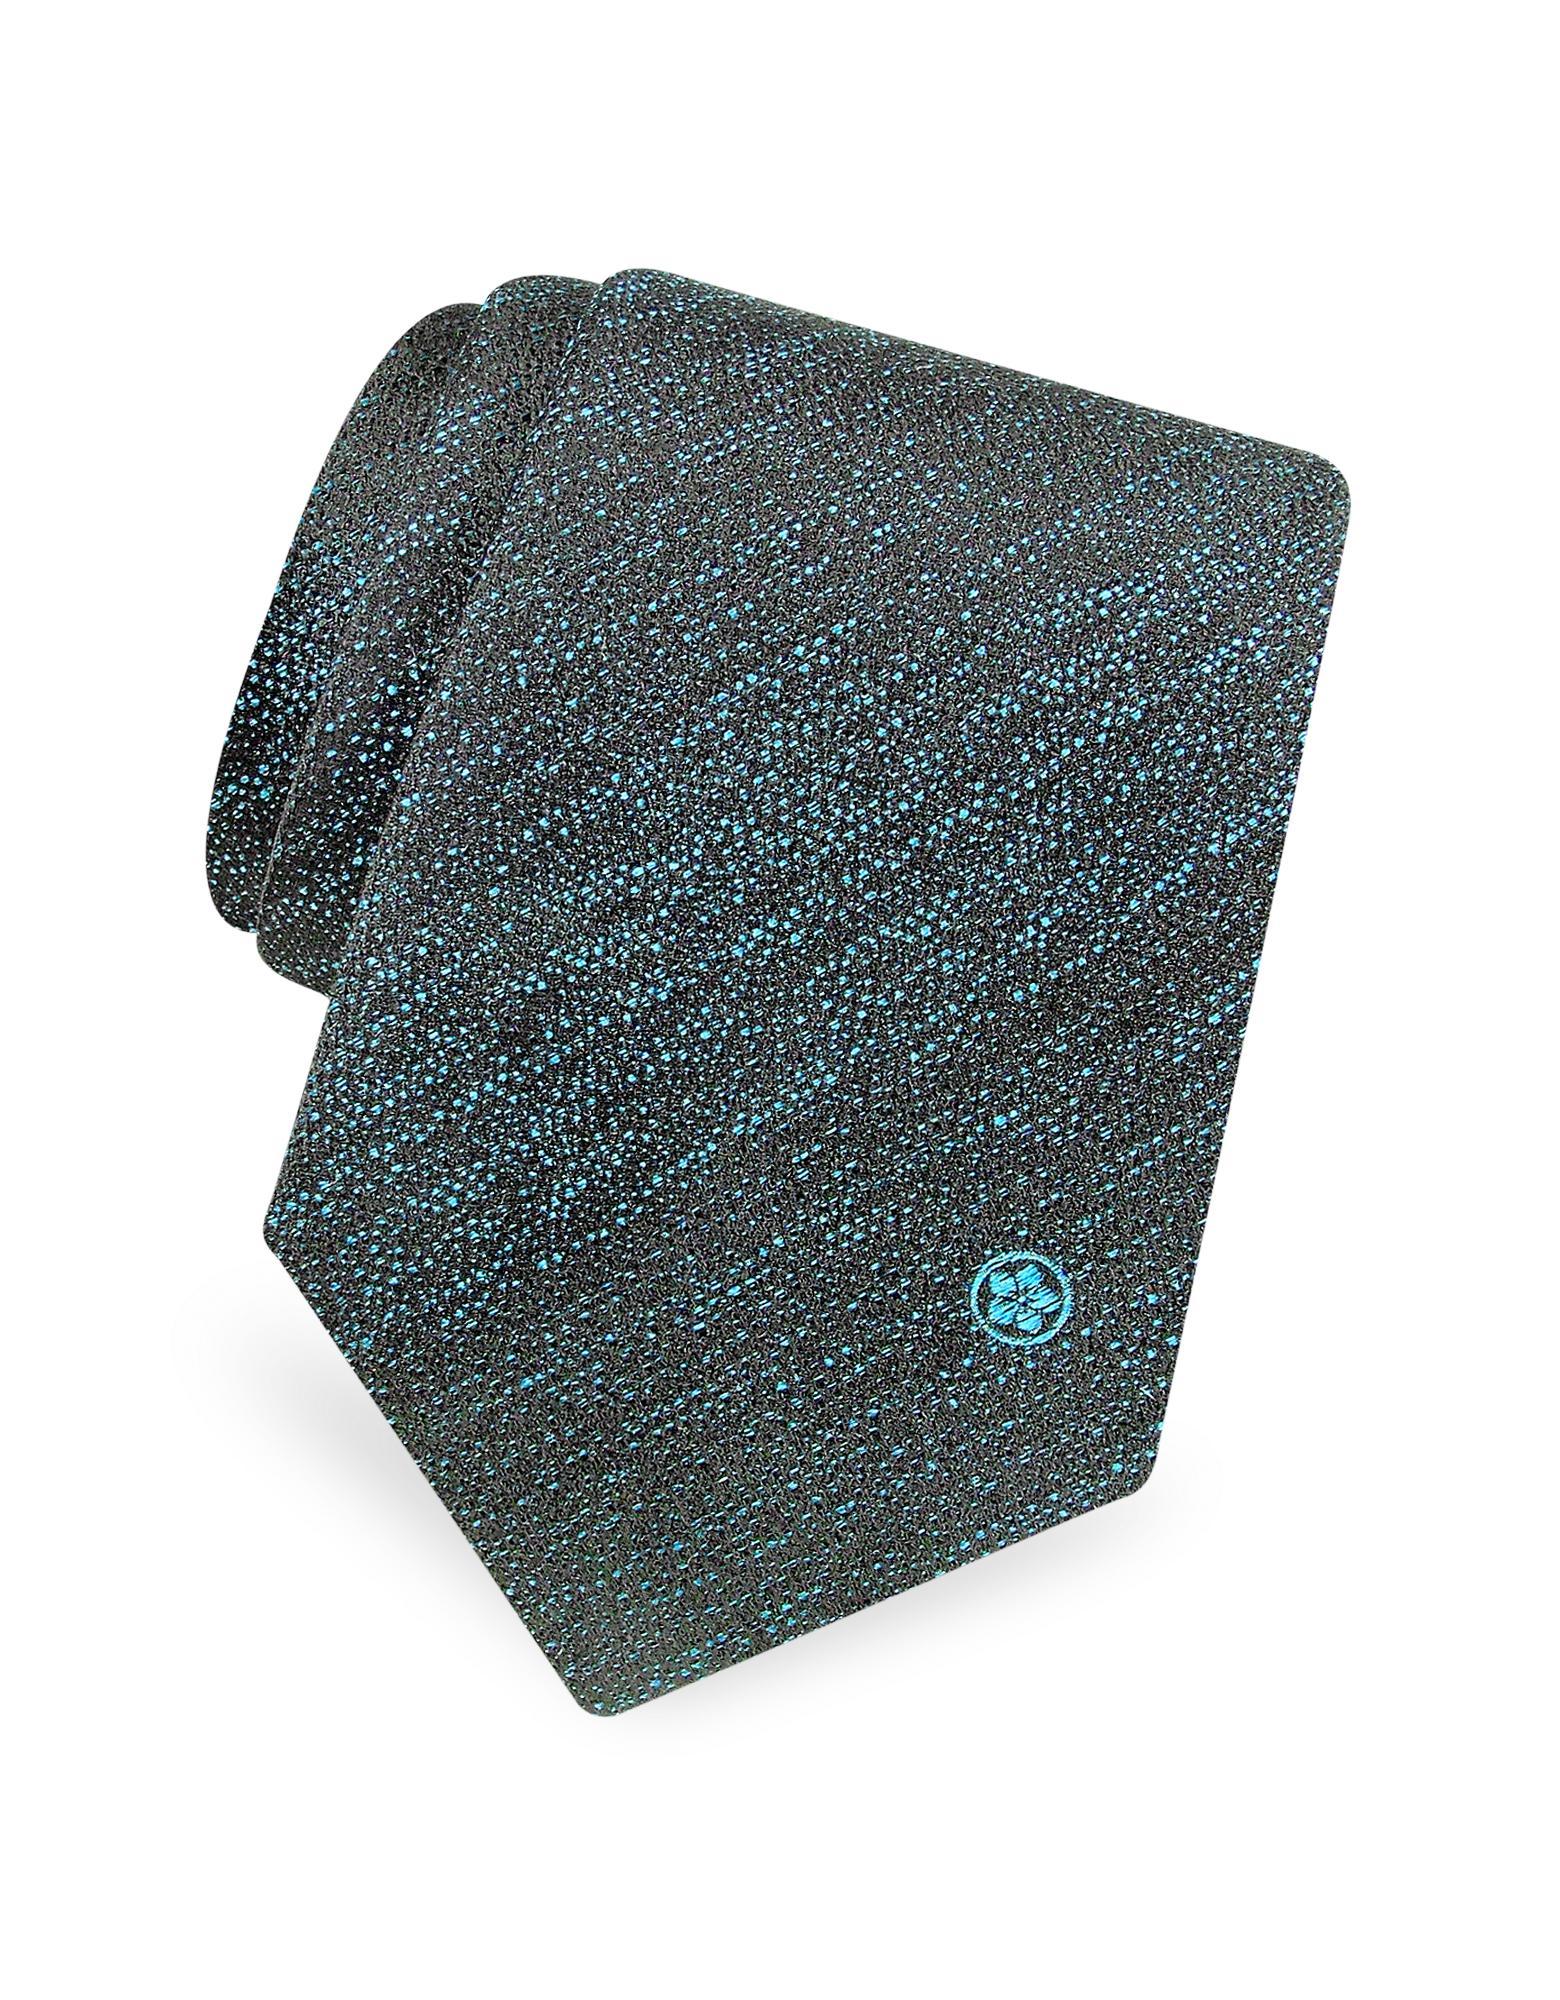 Gokan Kobo Touch Black and Petrol Blue Mini Logo Woven Silk Tie